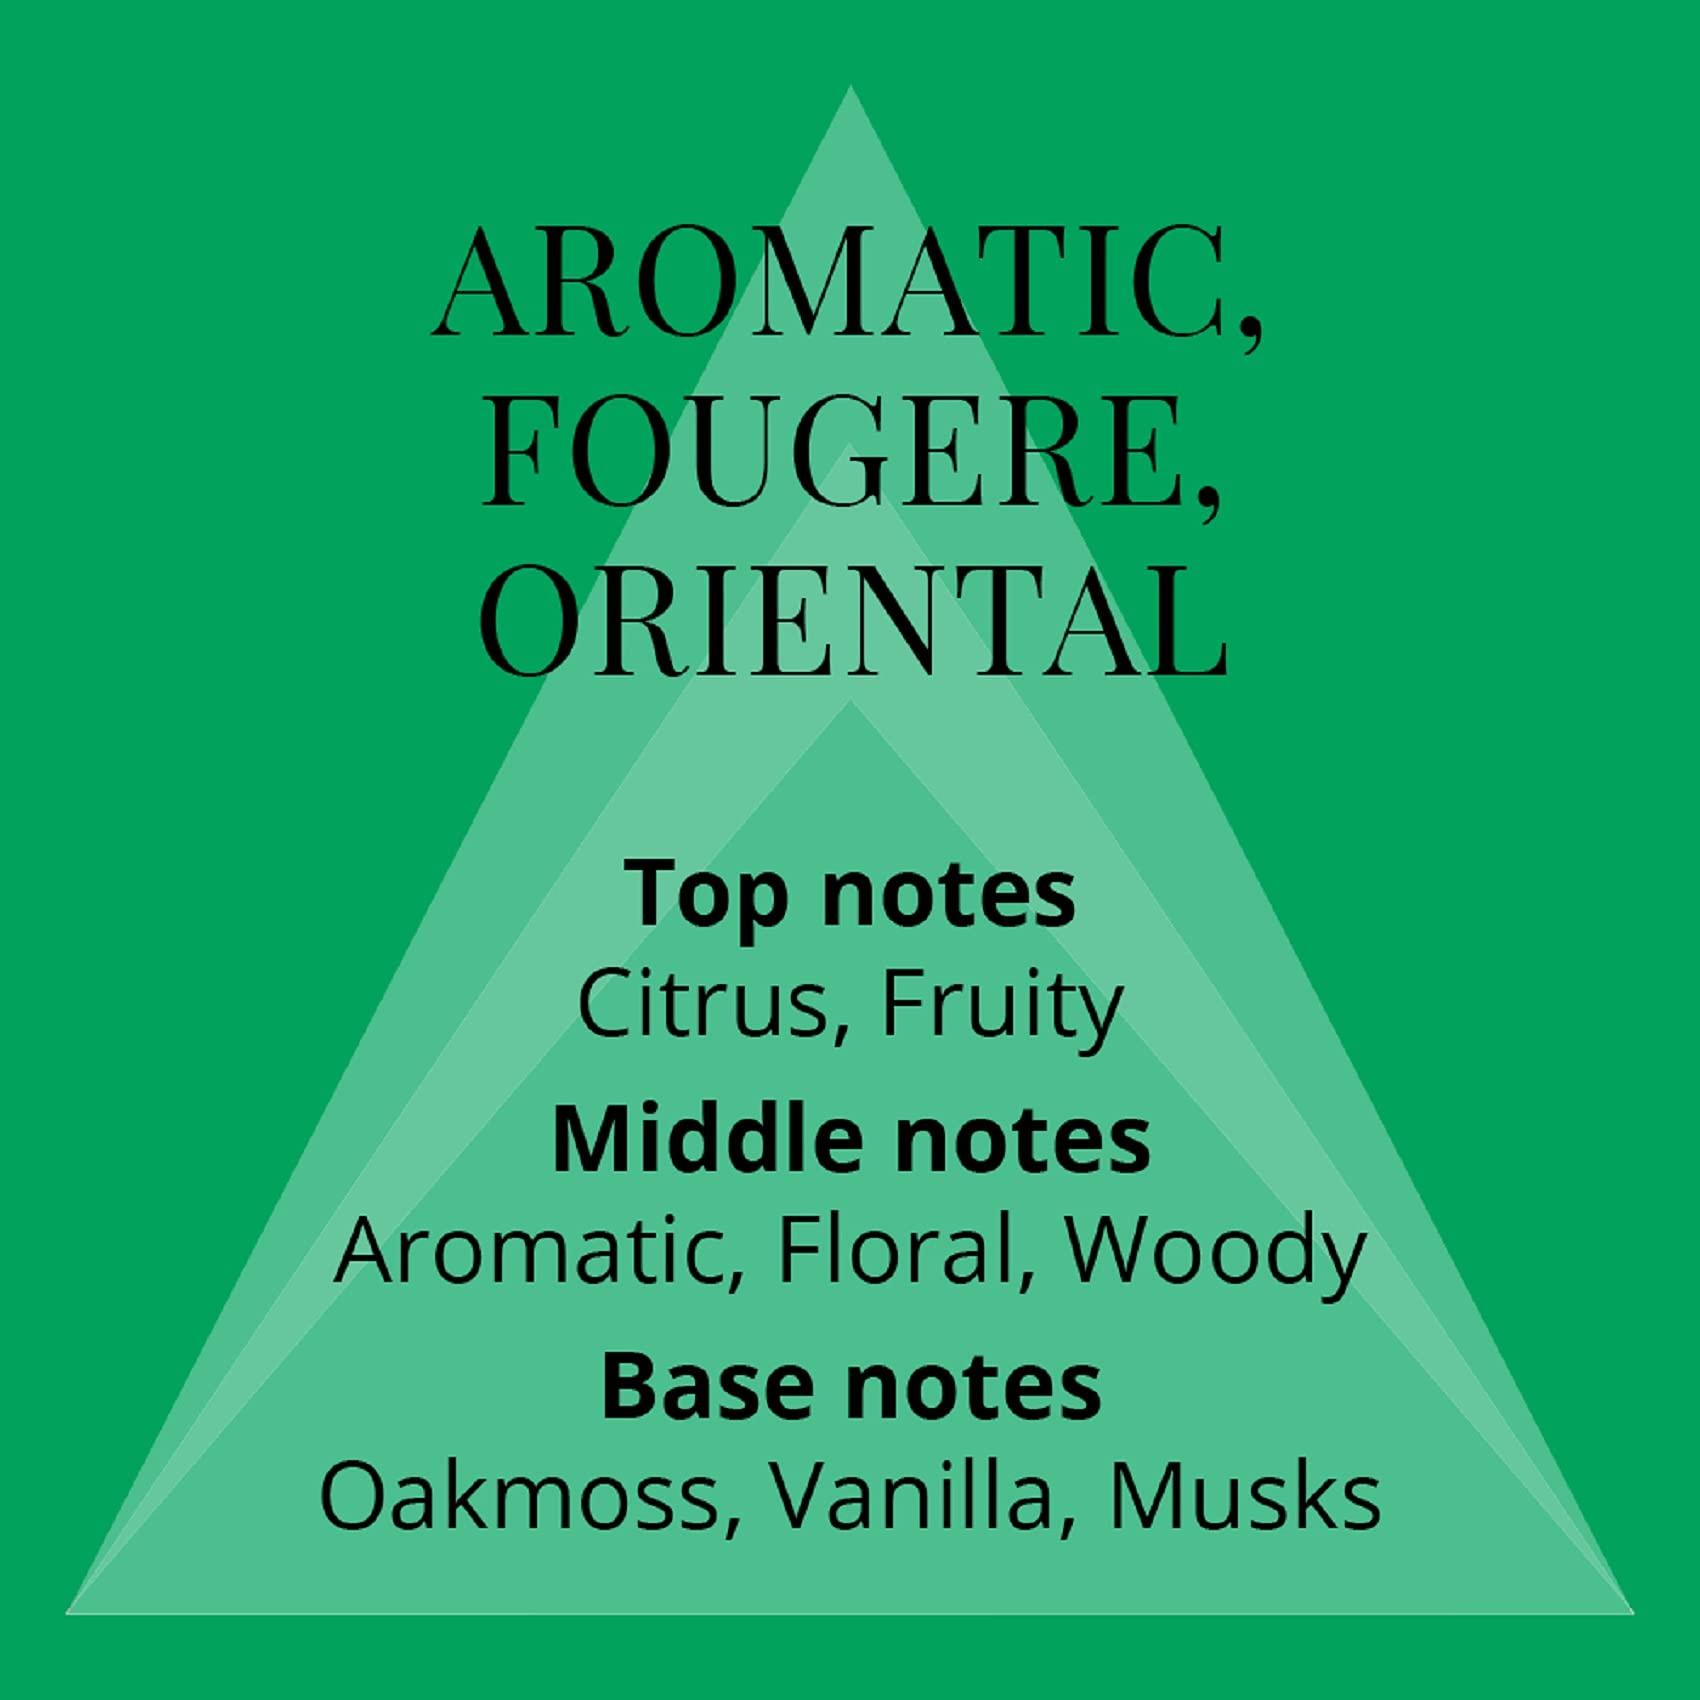 PERFUMER'S CHOICE No 9 by Victor - Fragrance for Men - Eau de Parfum, by Milton-Lloyd, 50ml